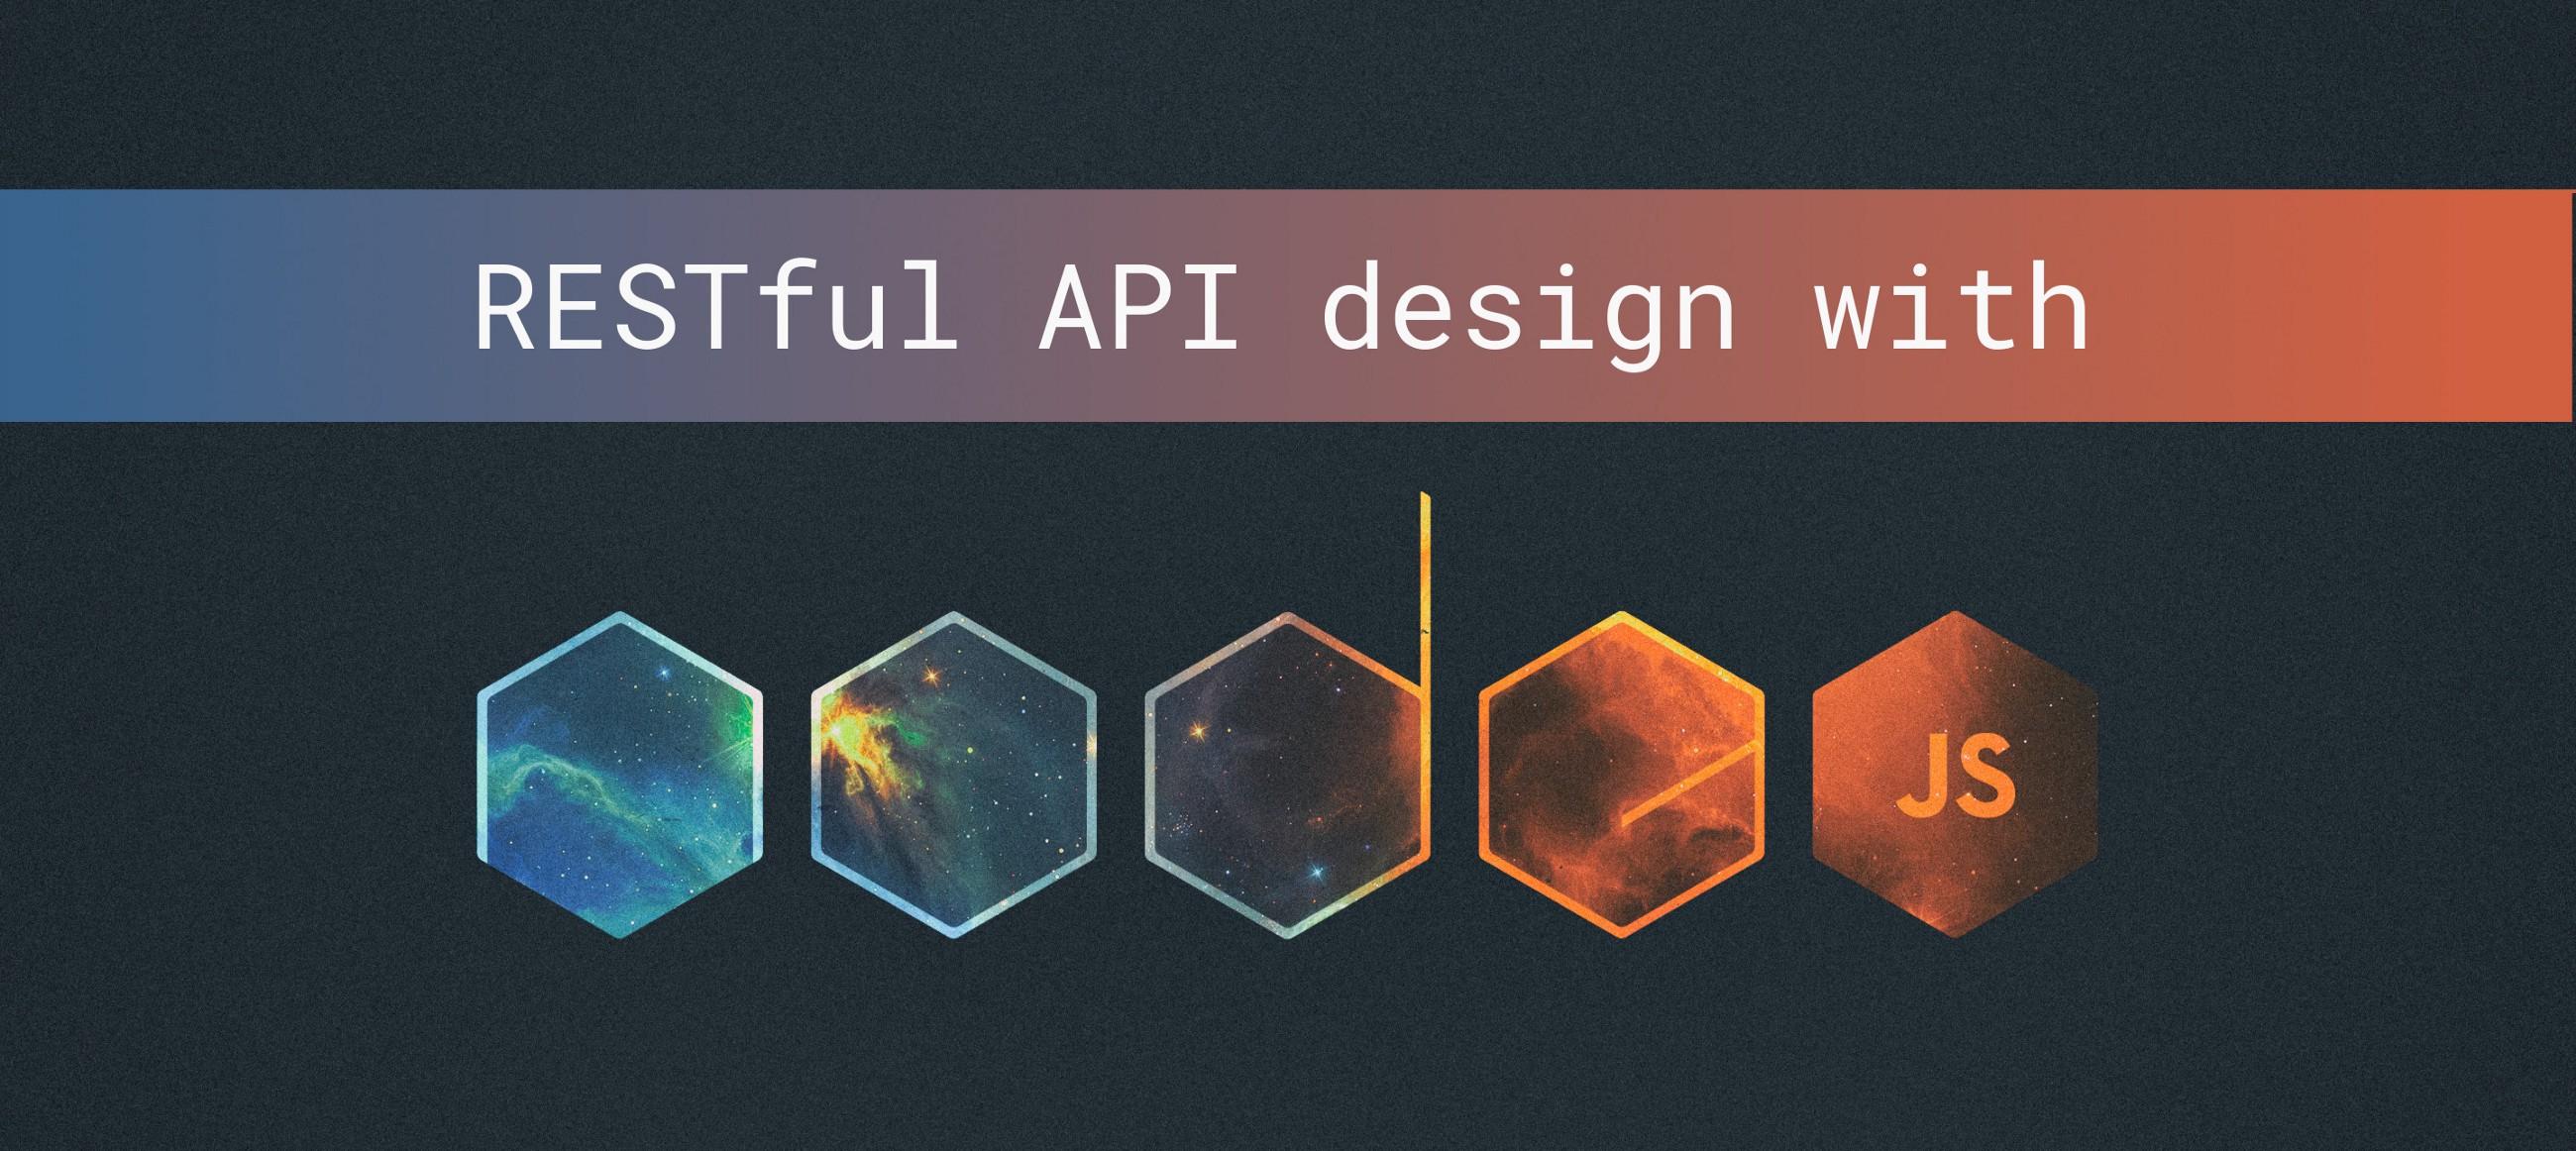 /restful-api-design-with-node-js-26ccf66eab09 feature image